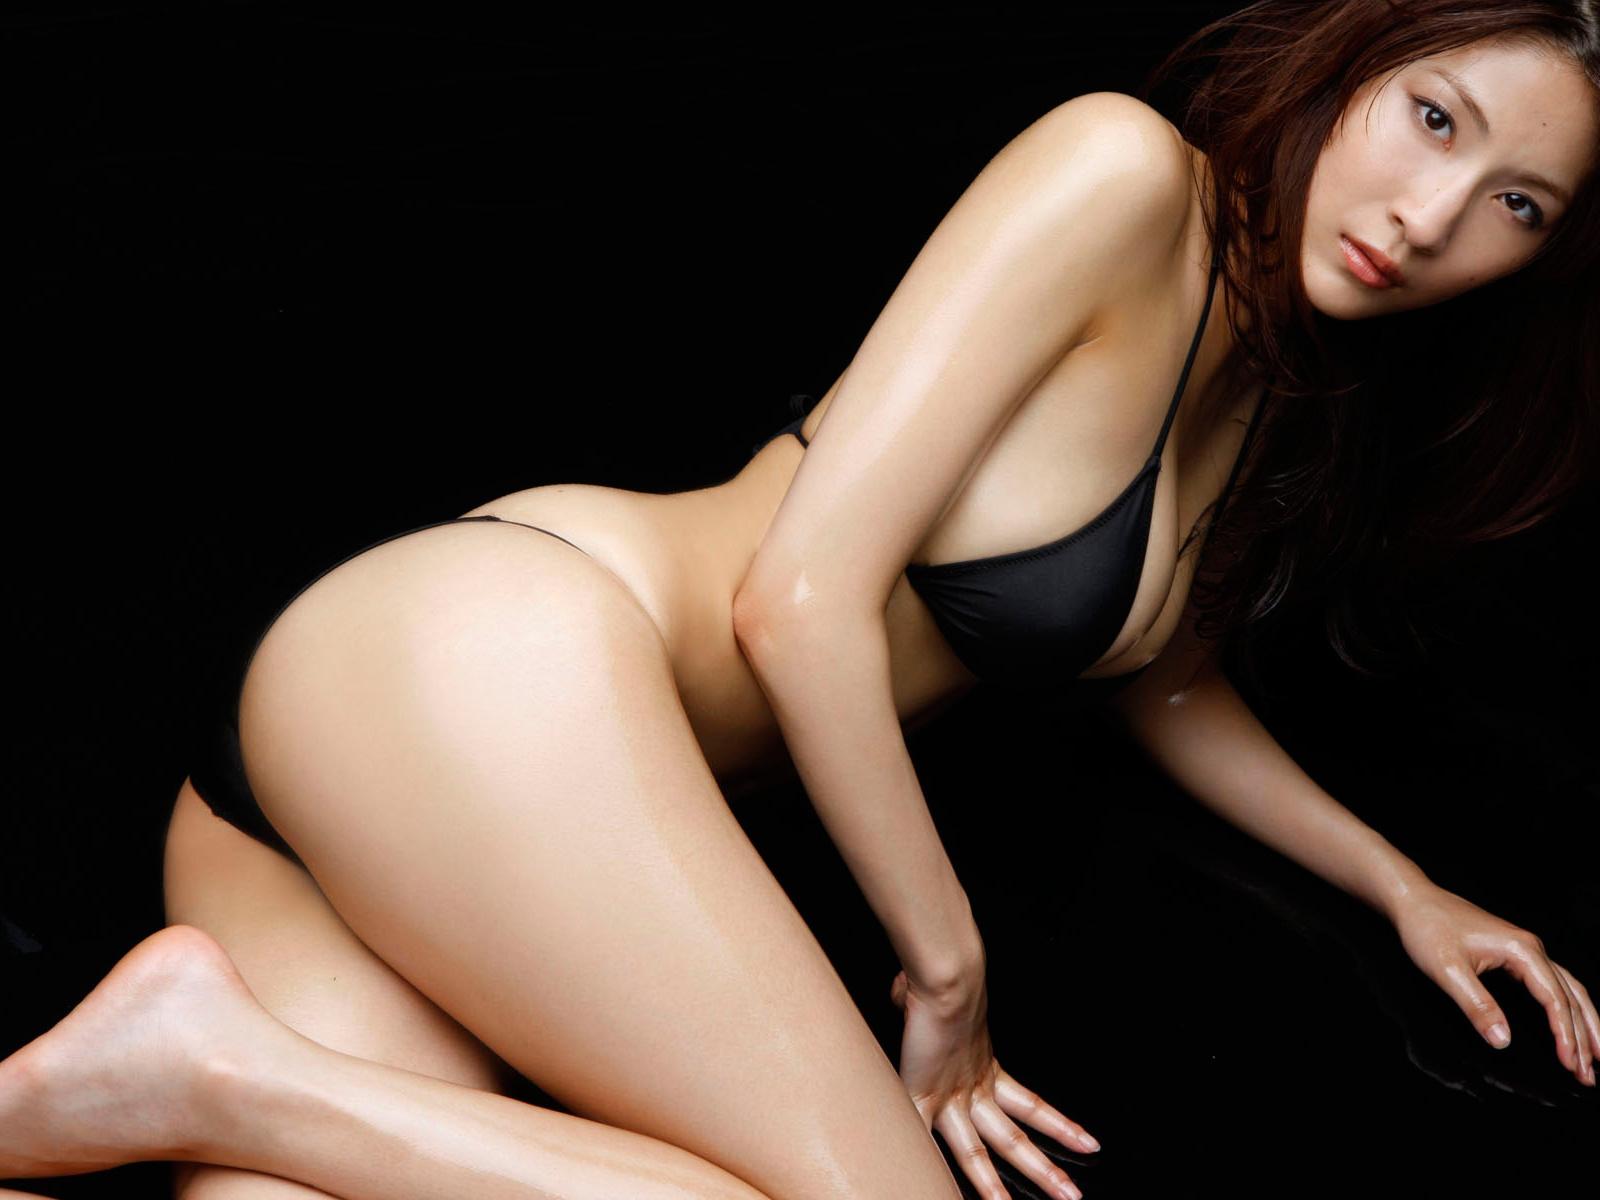 Фото секси азиатские девушки, Порно фото азиаток, Фотографии секса с азиатками 3 фотография